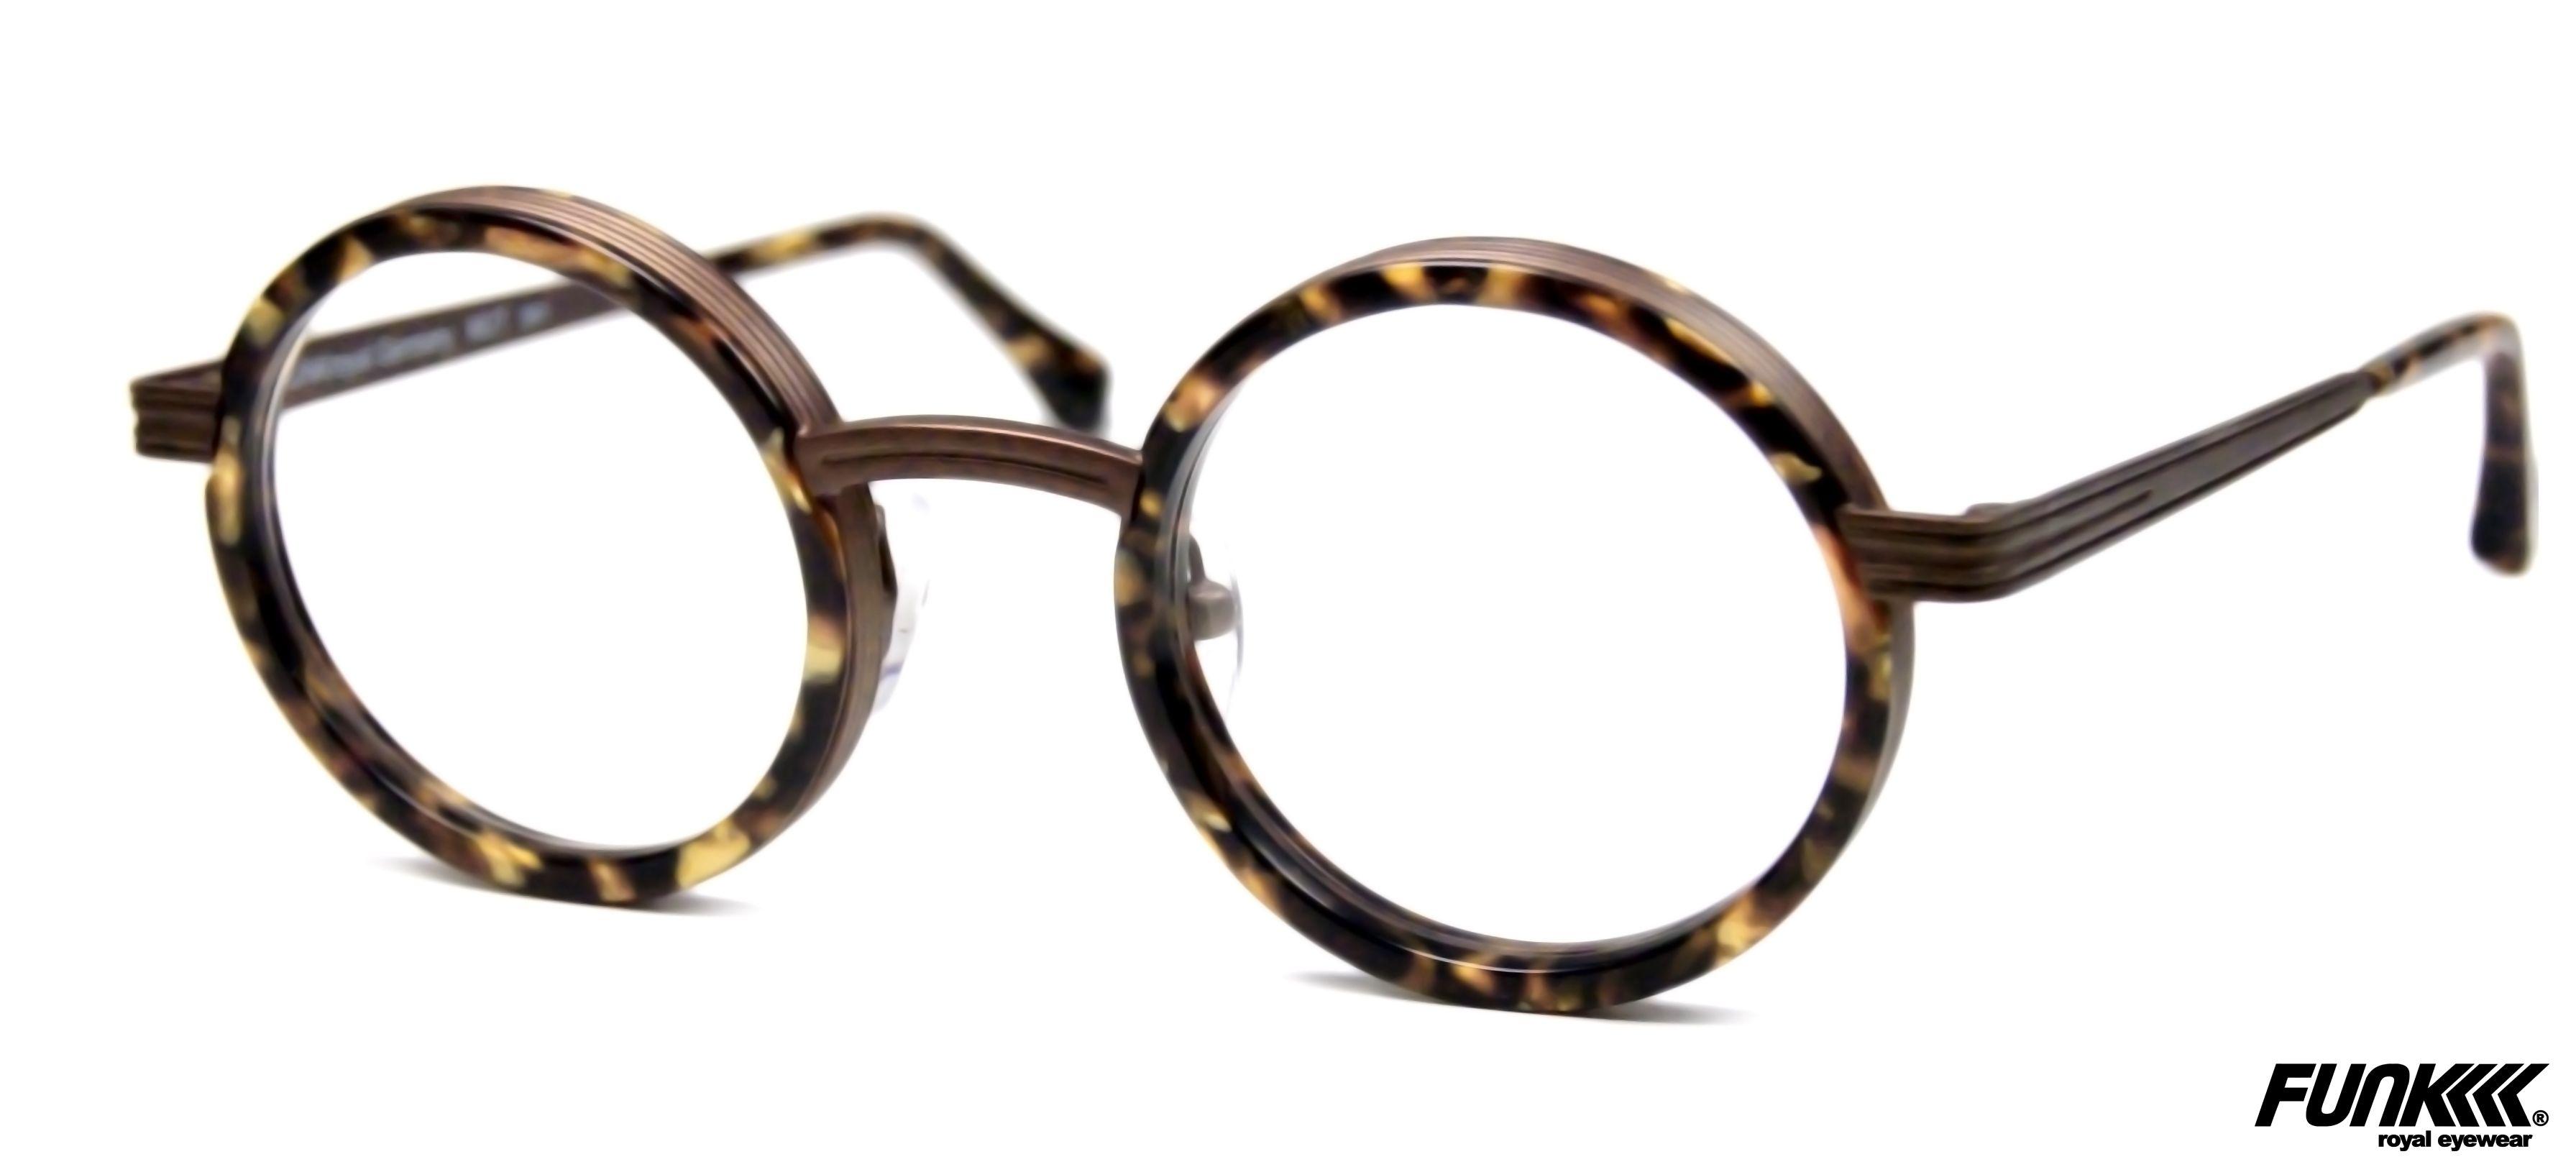 Pin Auf Dieter Funk Eyewear